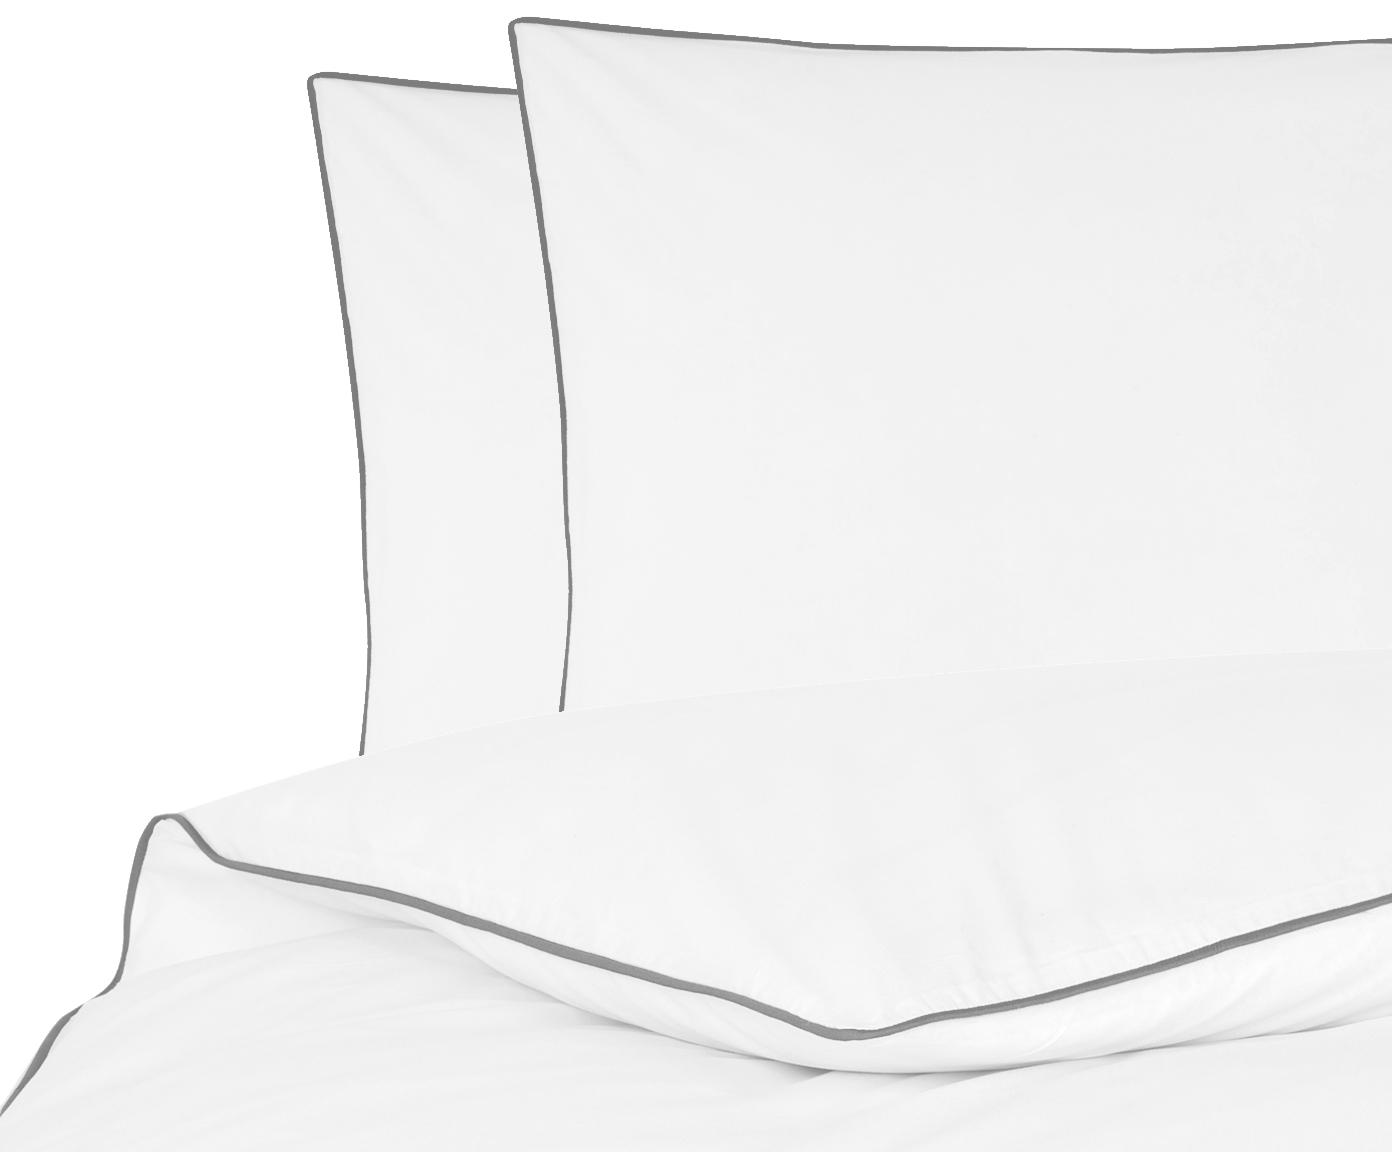 Baumwollperkal-Bettwäsche Daria in Weiß mit Keder, Webart: Perkal Fadendichte 200 TC, Weiß Kederumrandung: Dunkelgrau, 240 x 220 cm + 2 Kissen 80 x 80 cm